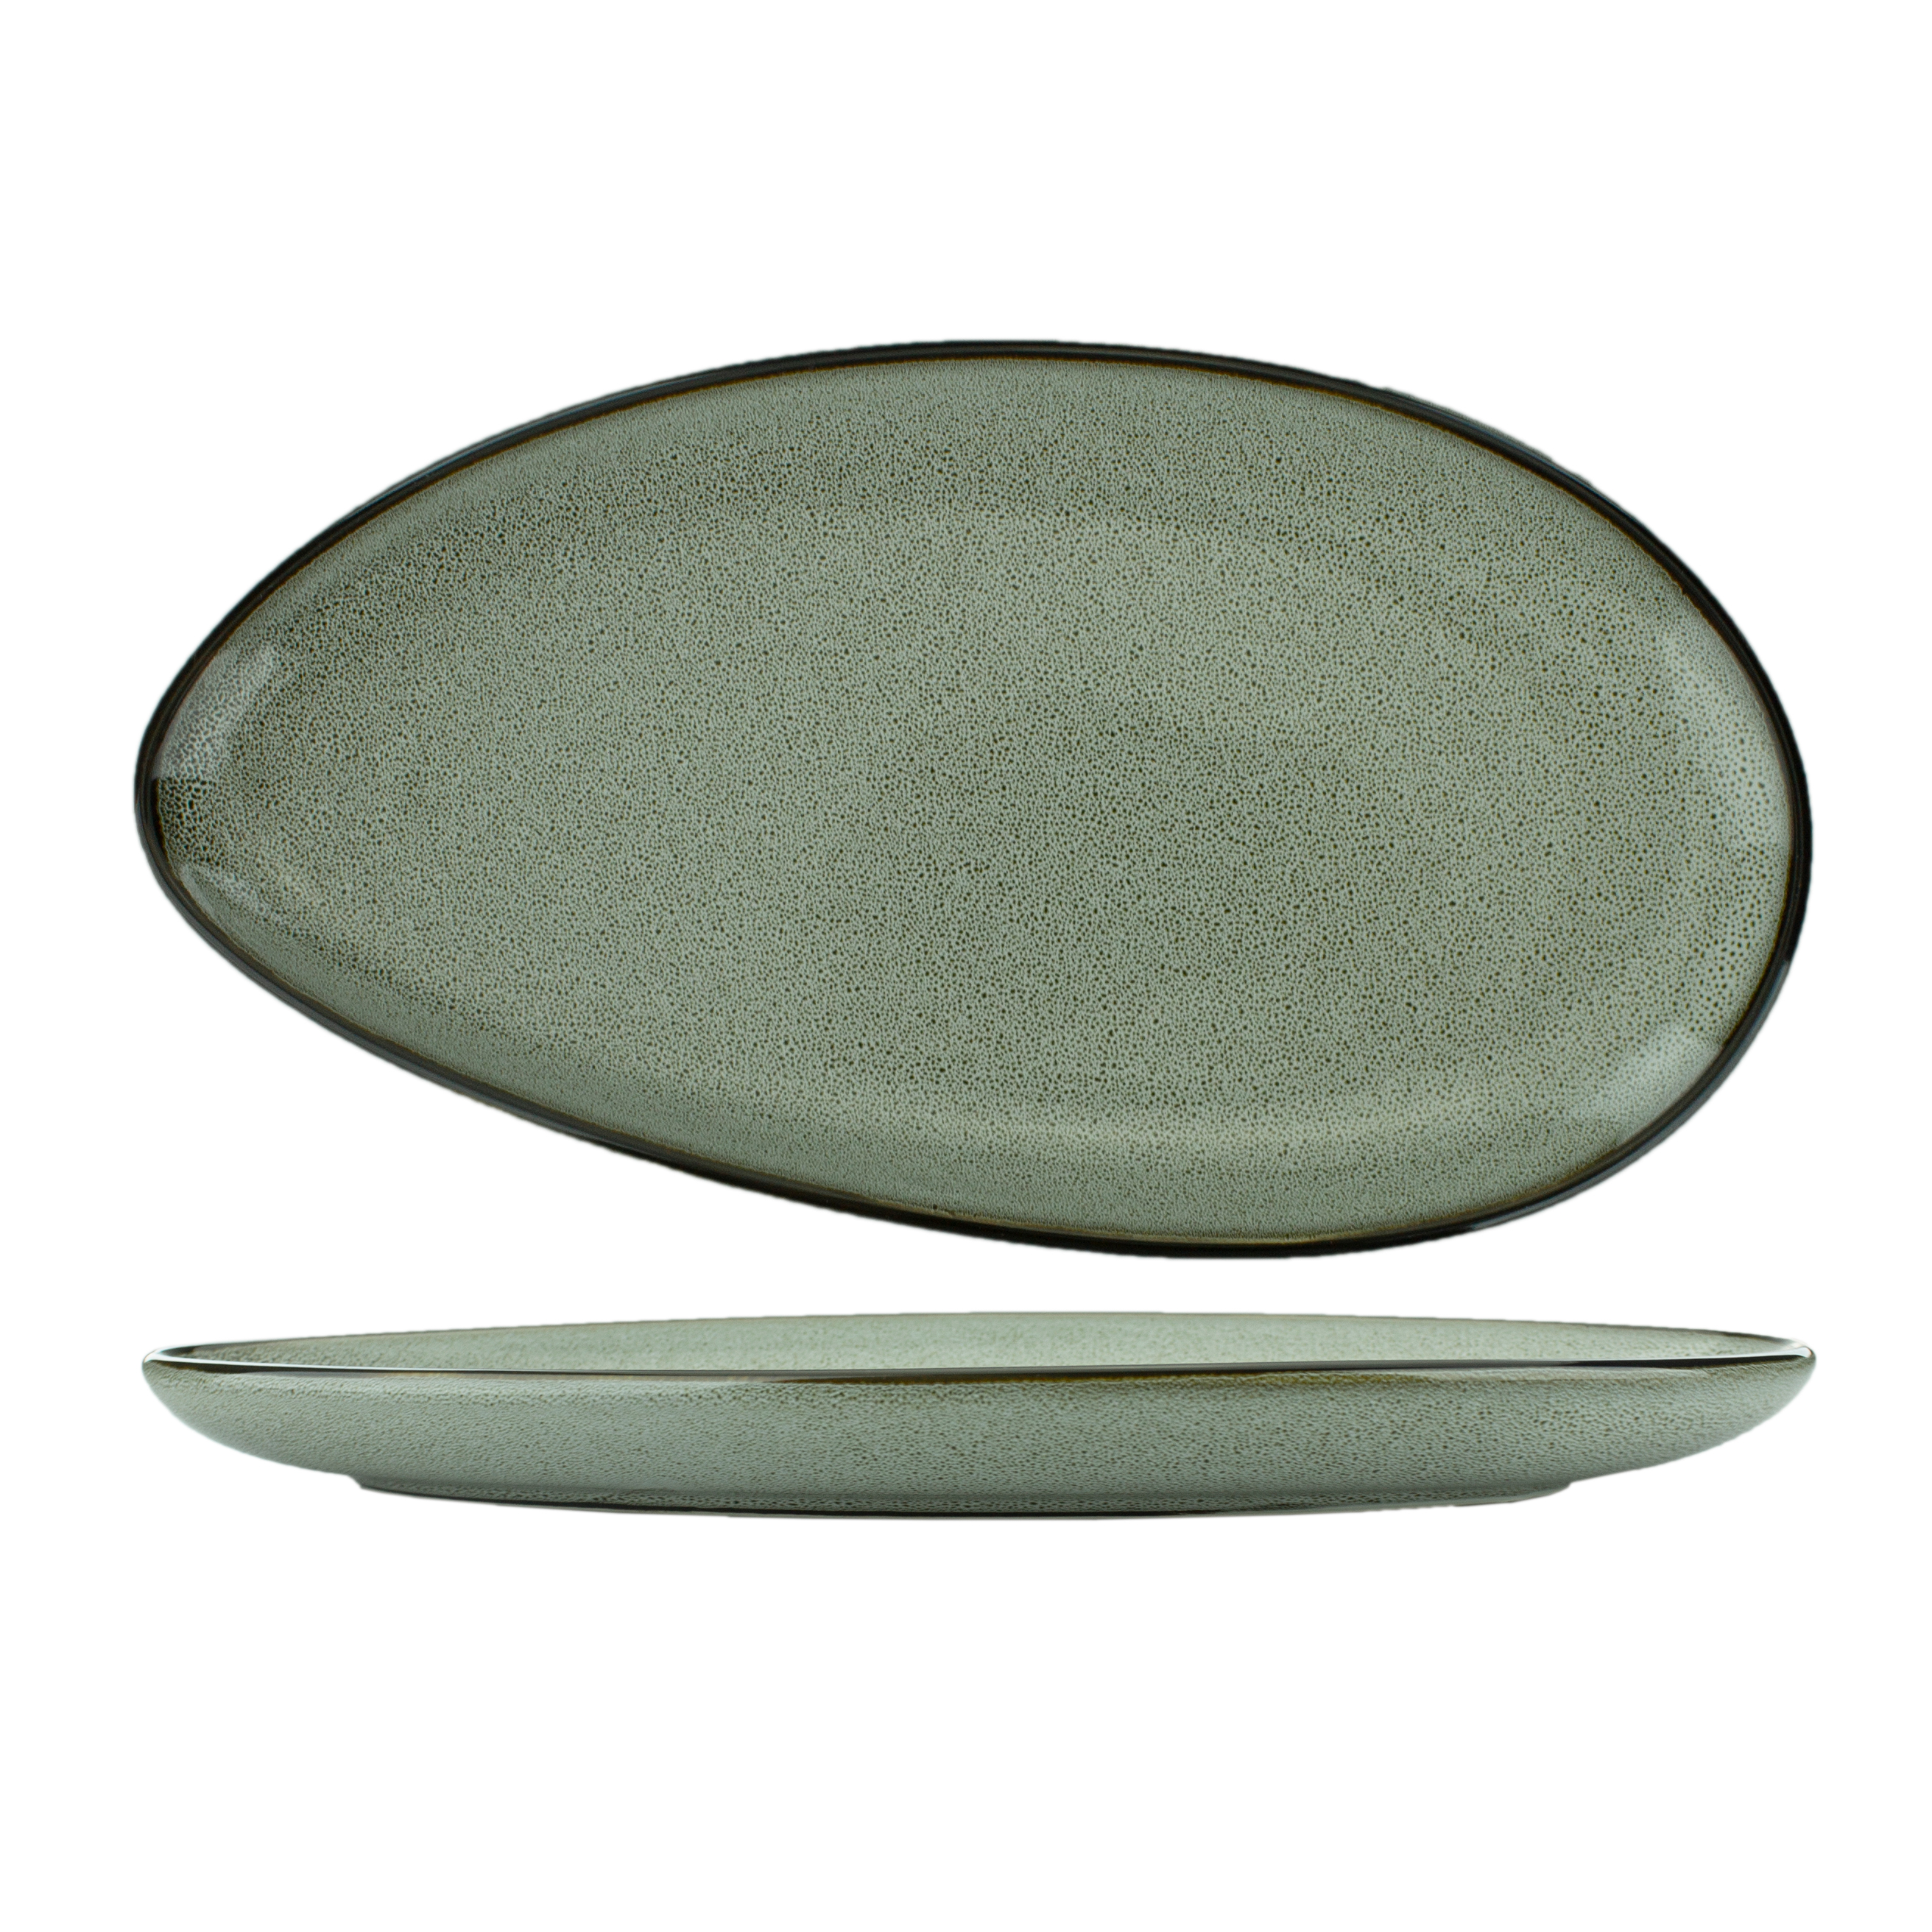 International Tableware LU-14-AS platter, china